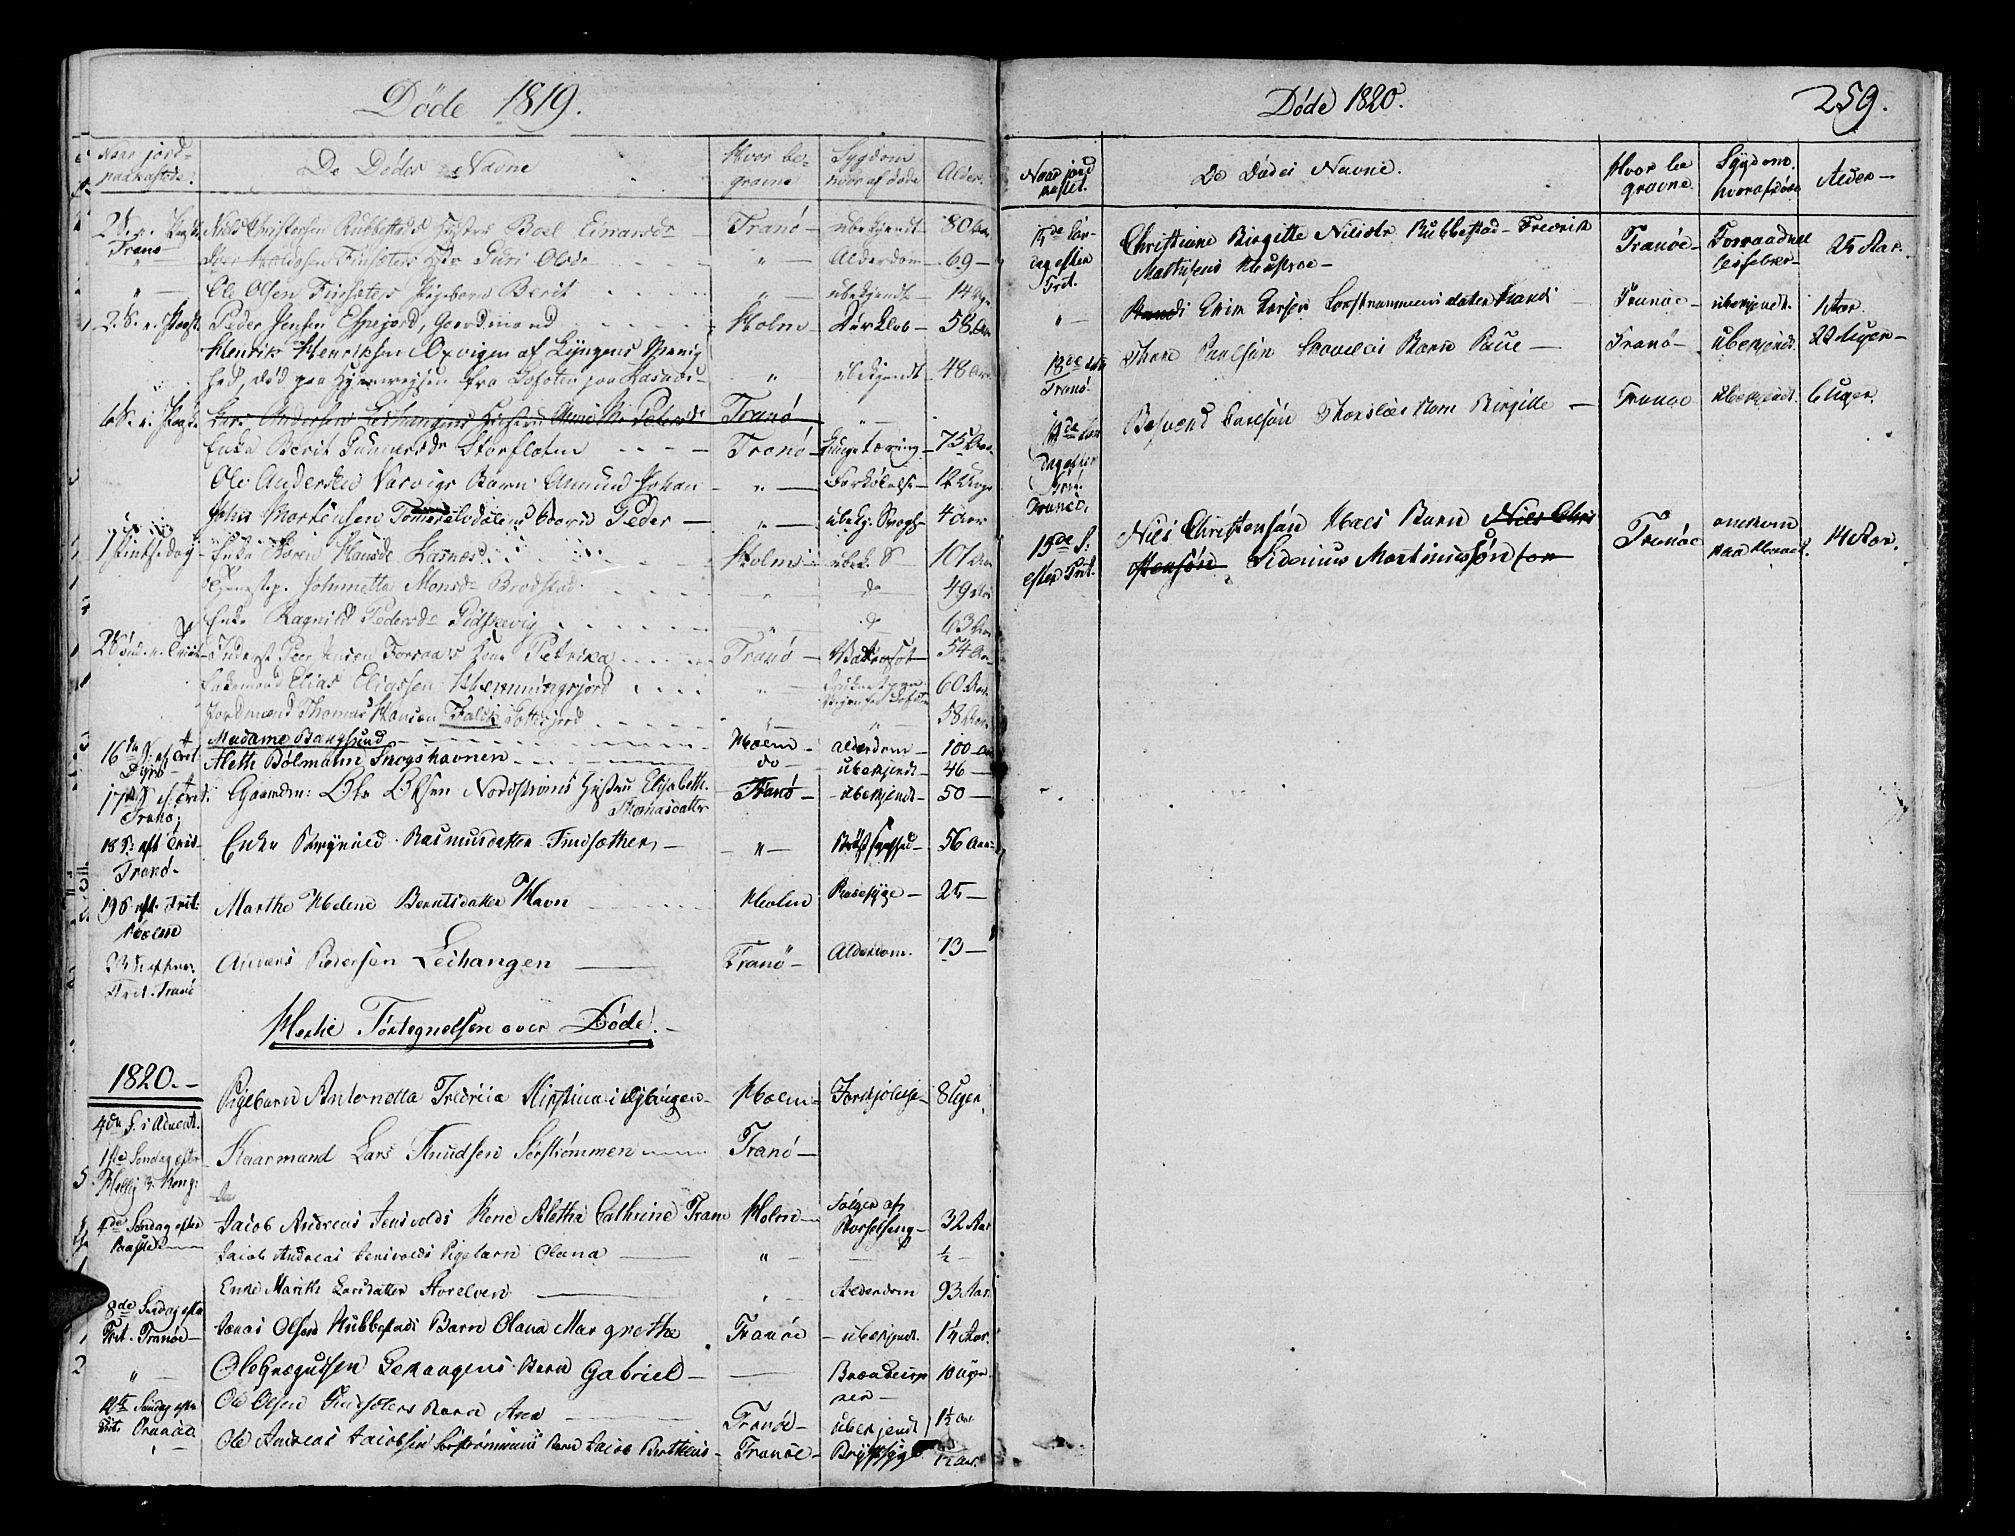 SATØ, Tranøy sokneprestkontor, I/Ia/Iaa/L0003kirke: Ministerialbok nr. 3, 1807-1820, s. 259